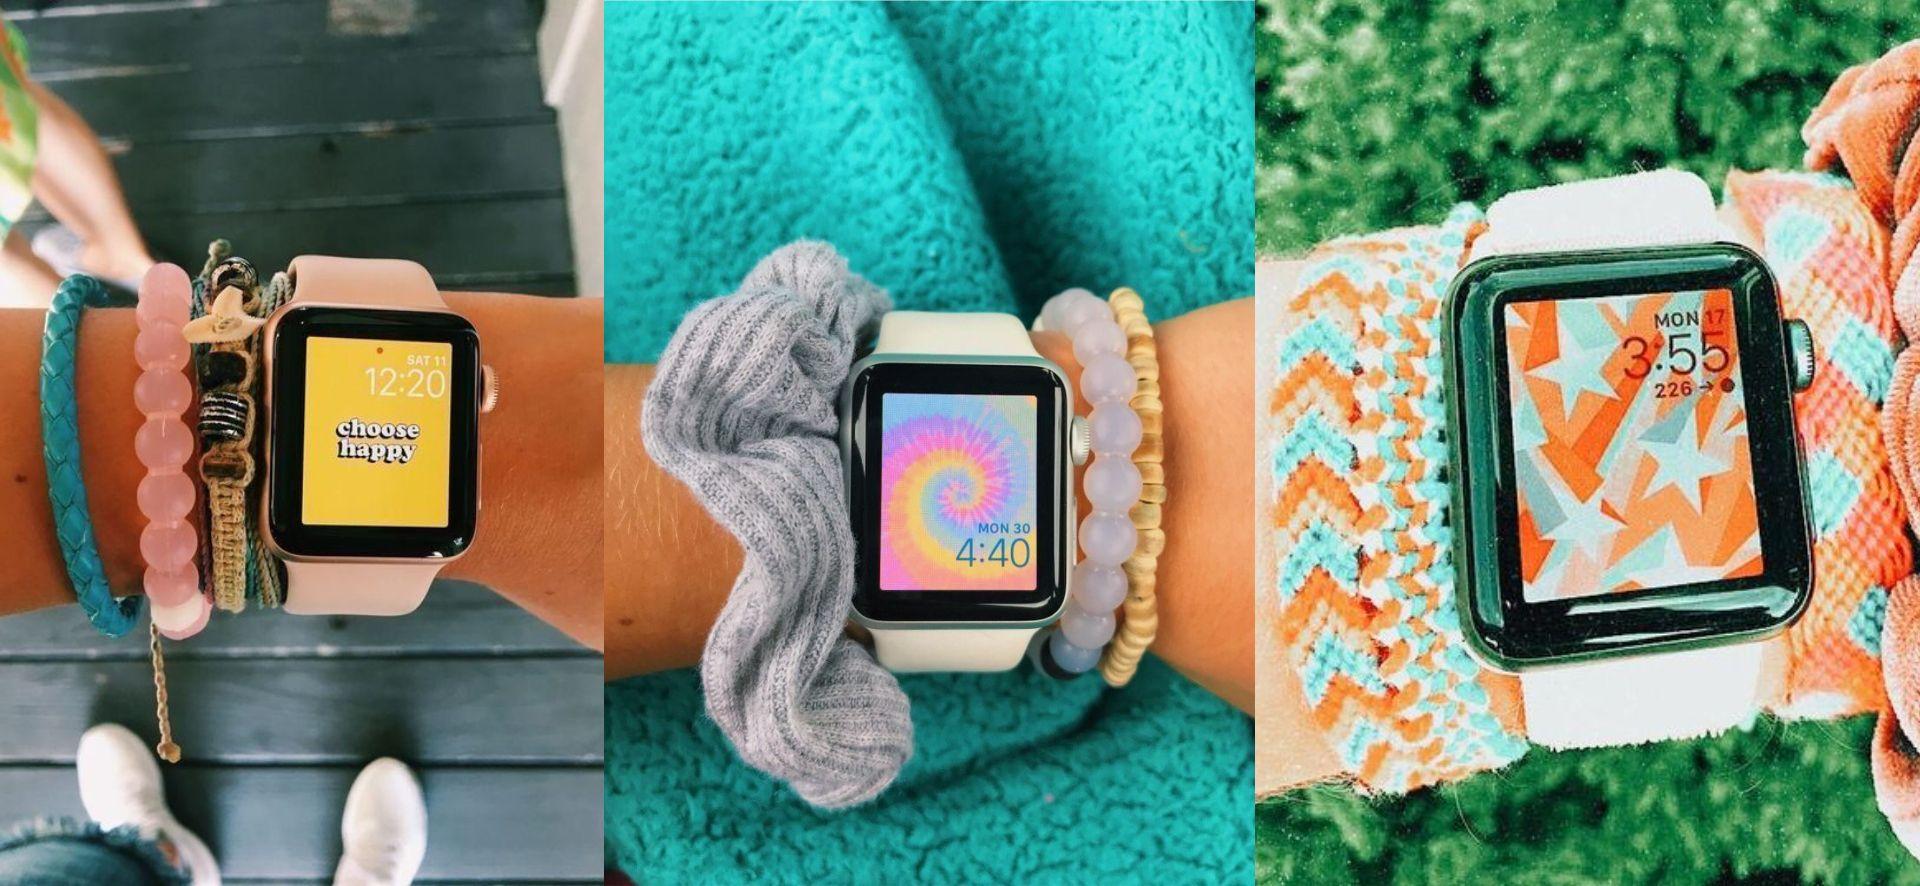 How To Make An Apple Watch Wallpaper